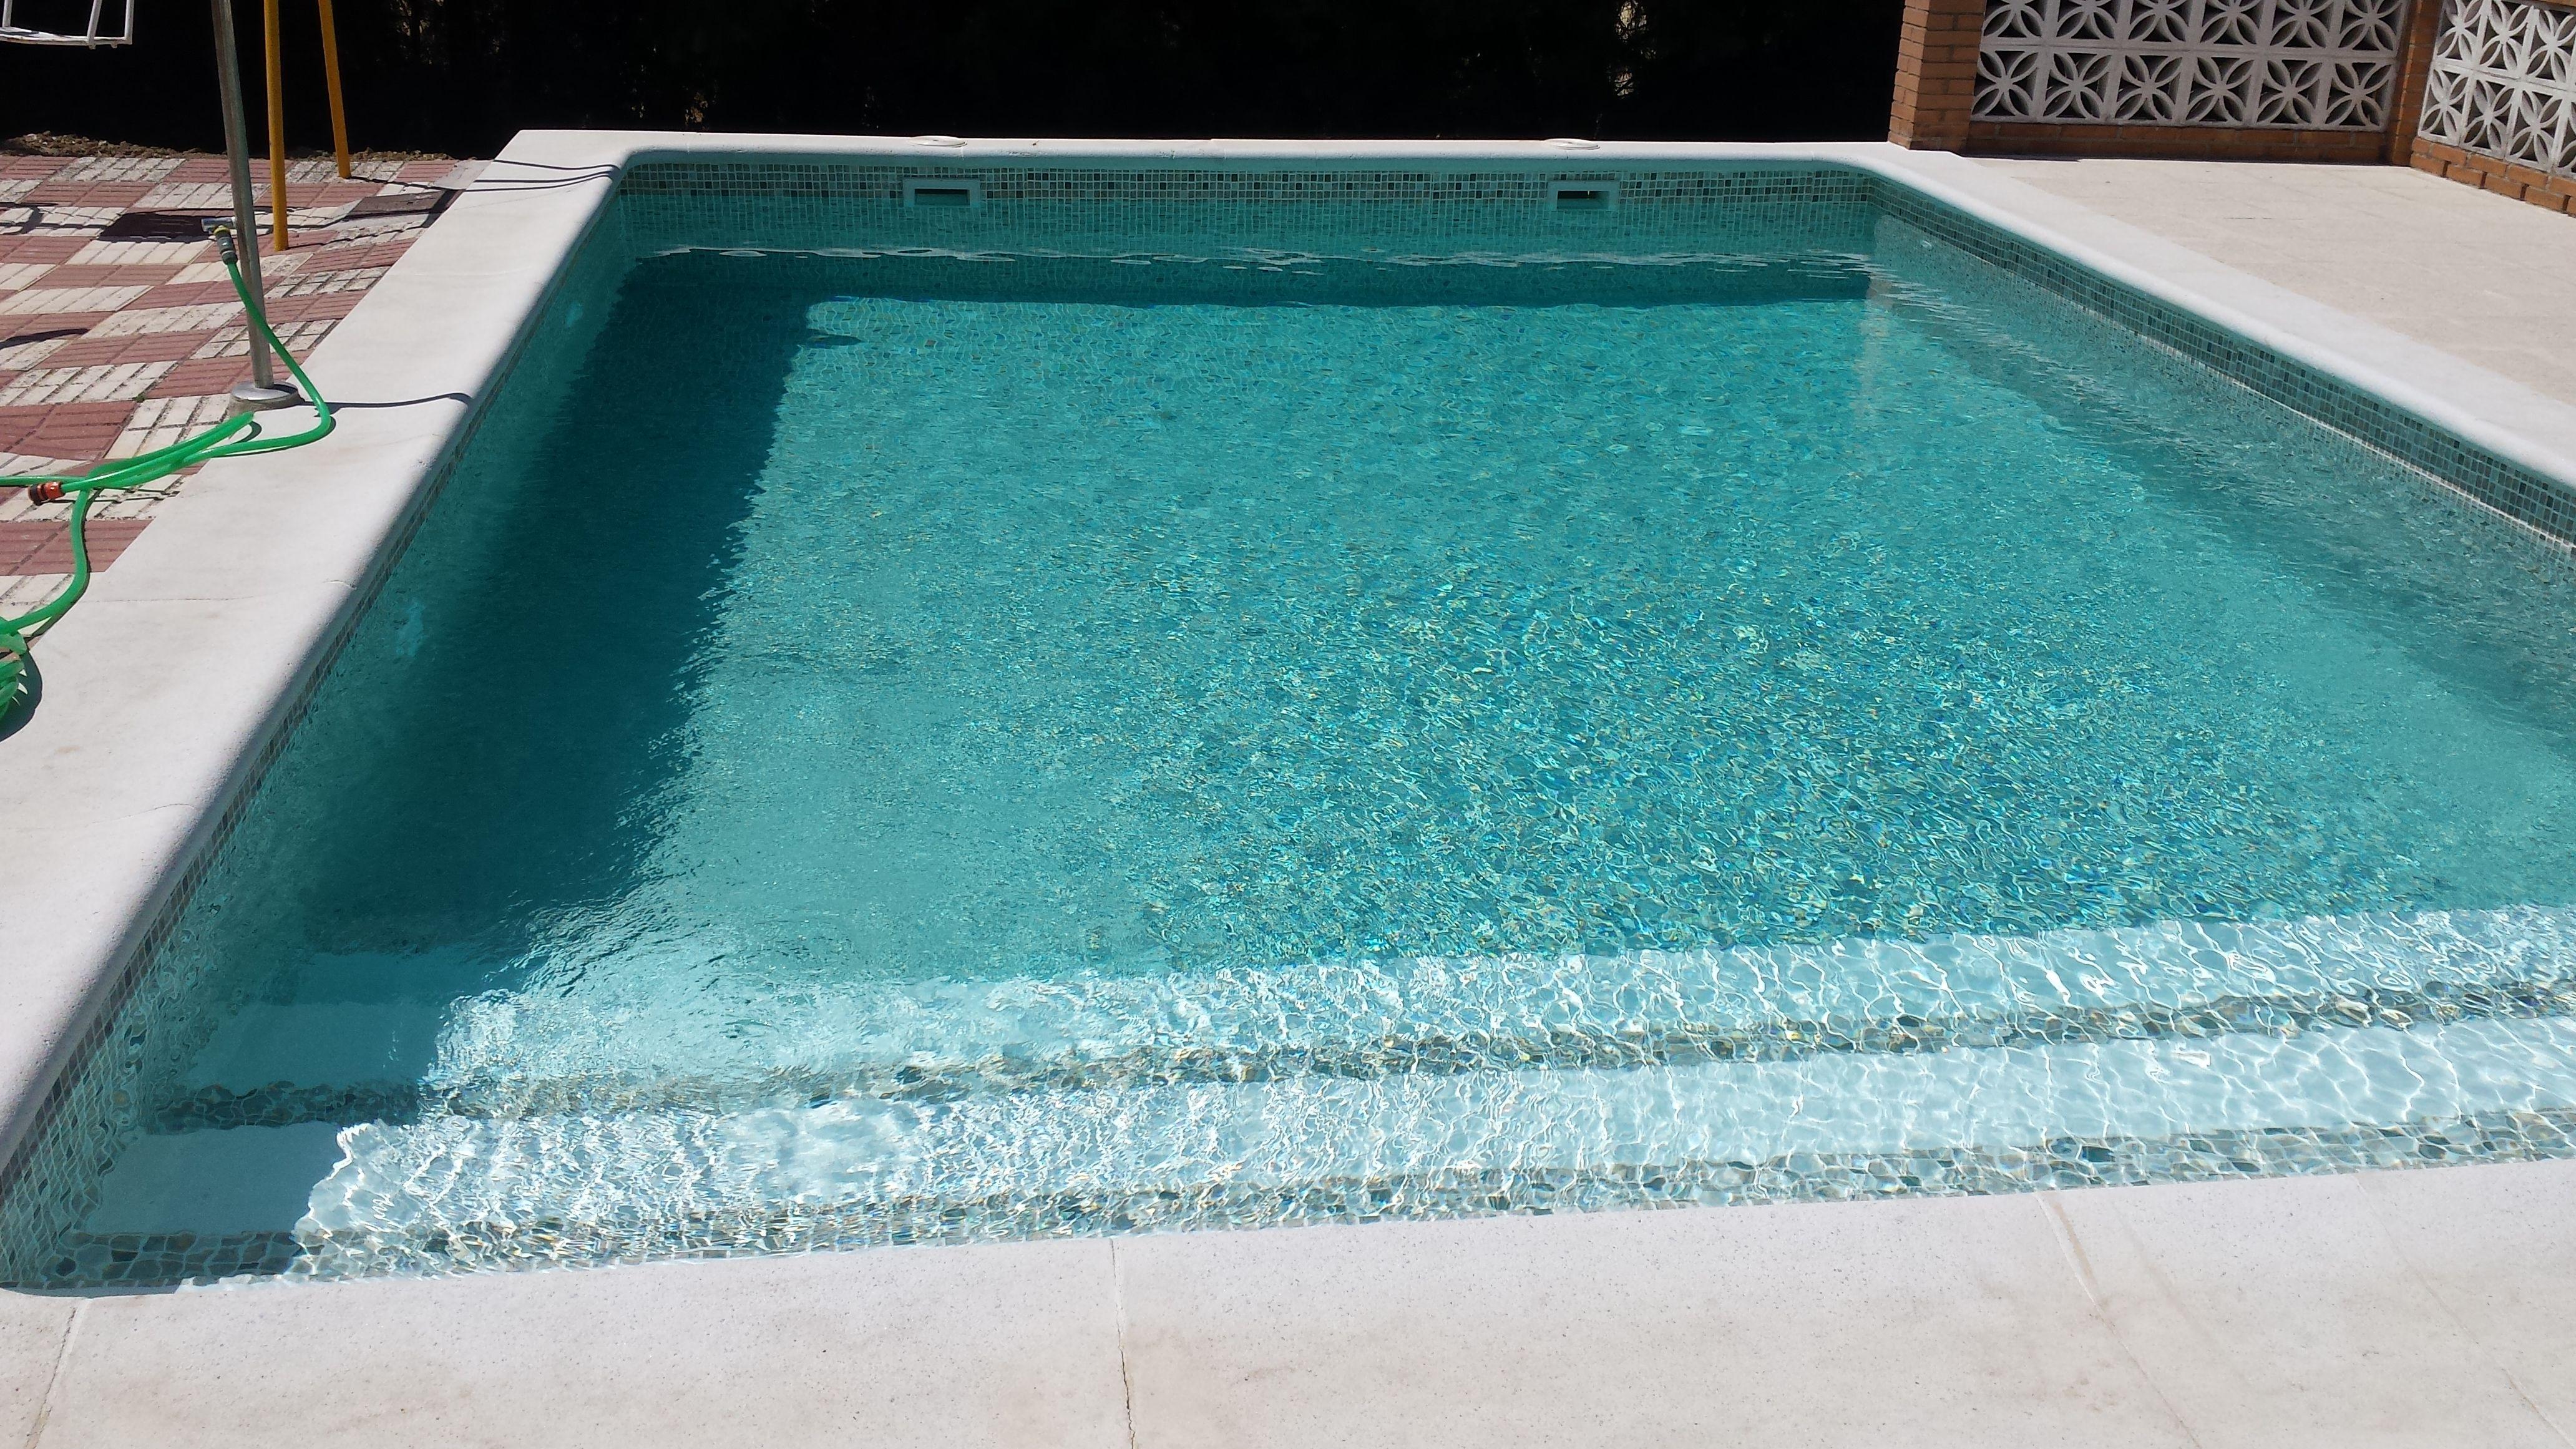 Reforma a liner armado reforma de piscinas a lamina for Liner para piscinas desmontables